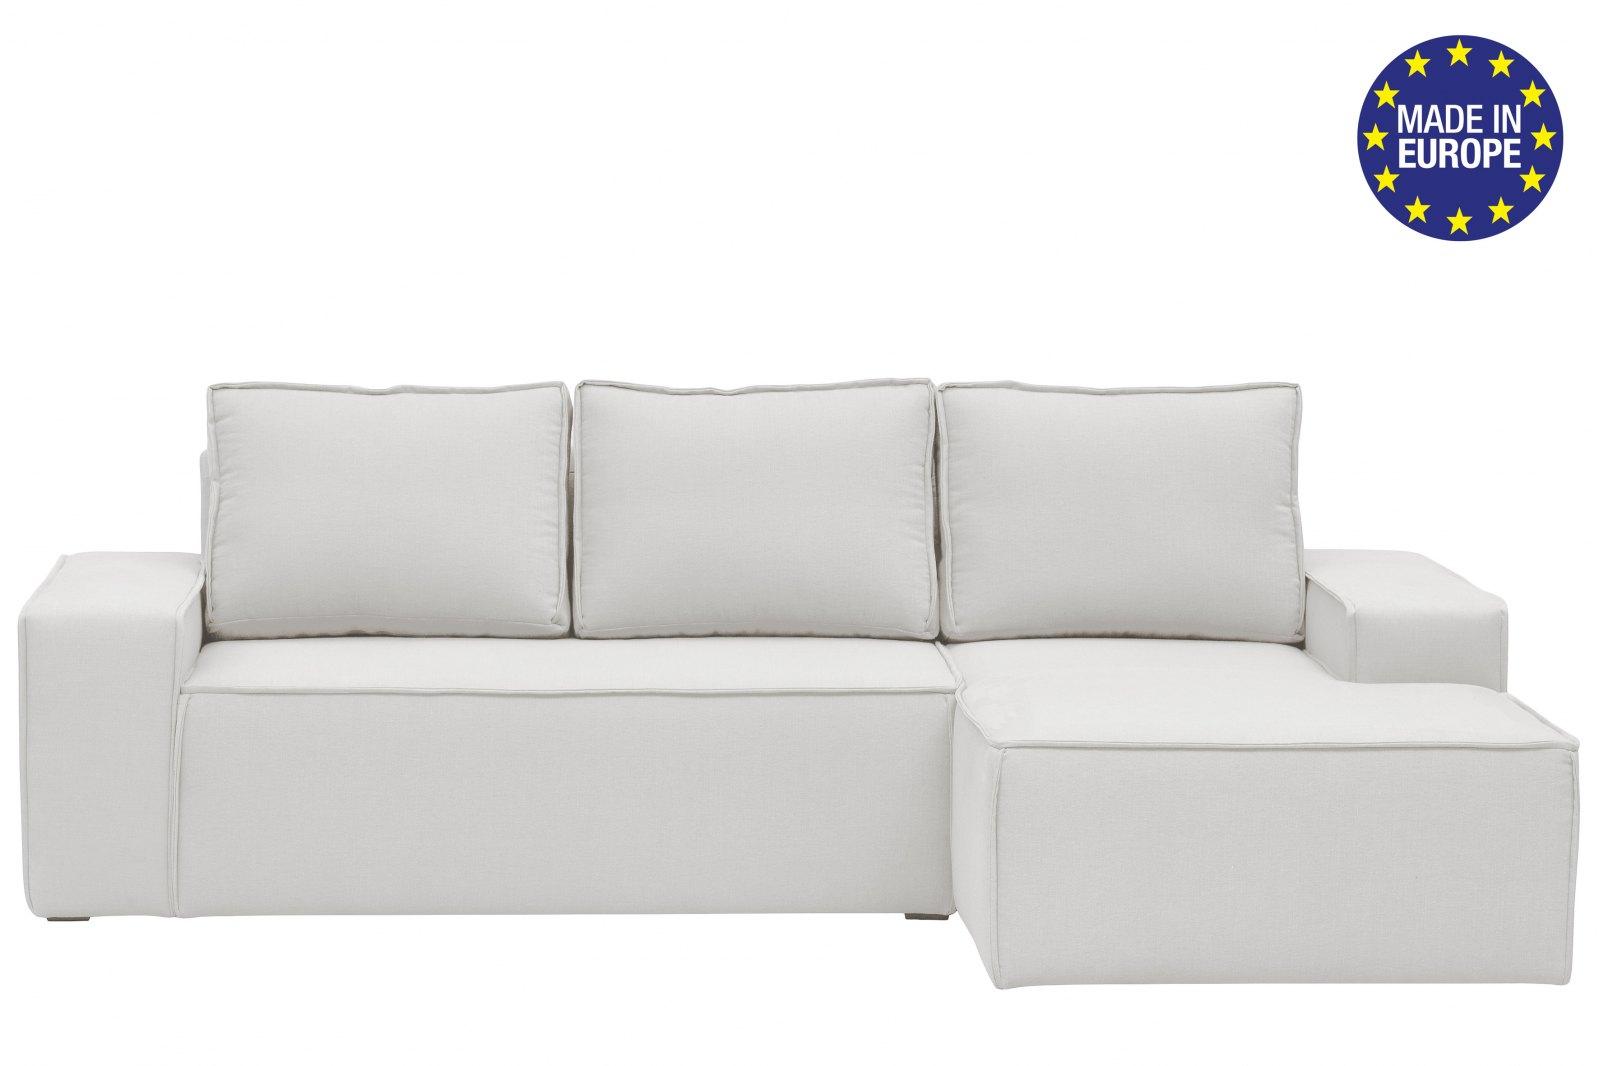 Hoxton Corner Sofa - Right Hand  / 1